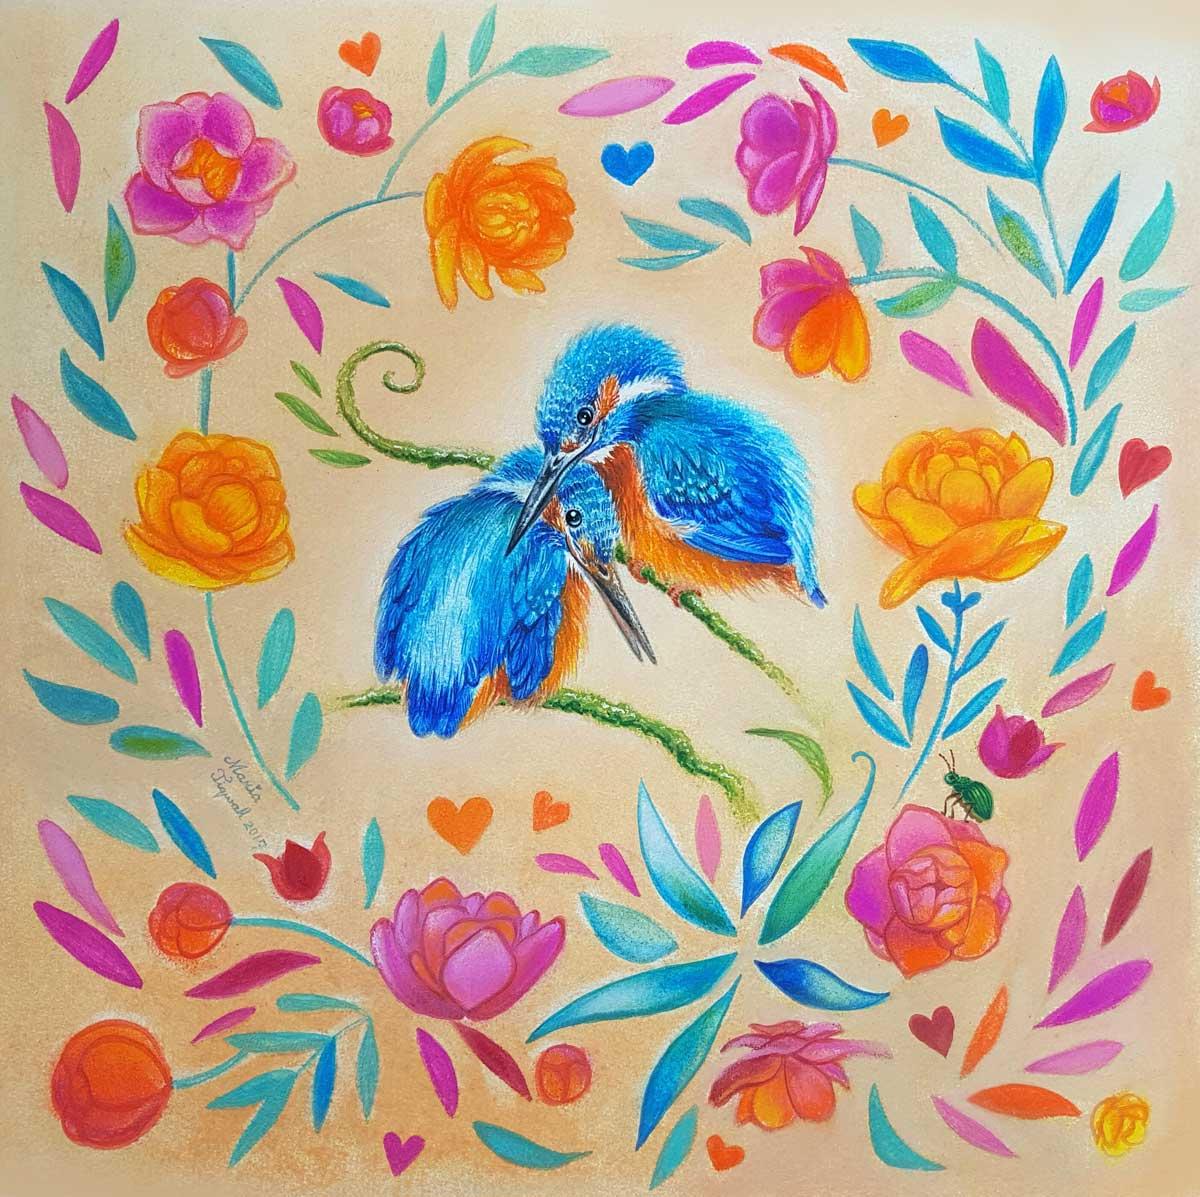 kingsfishers